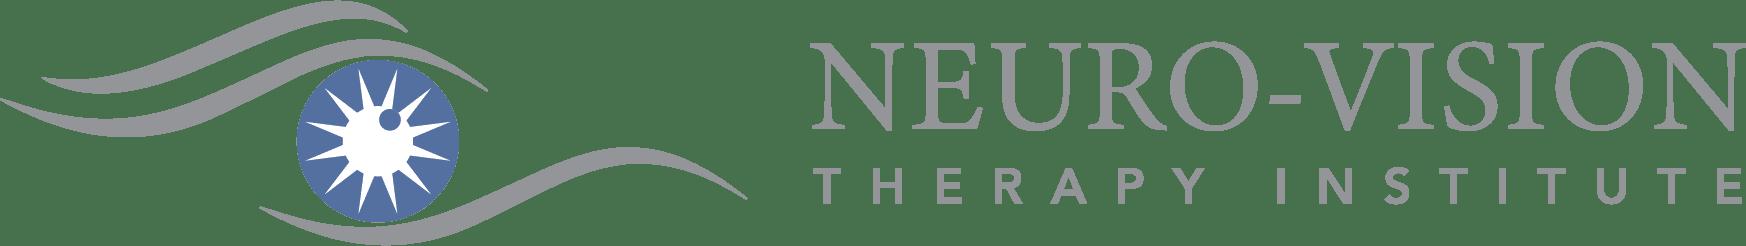 Neuro-Vision Therapy Institute